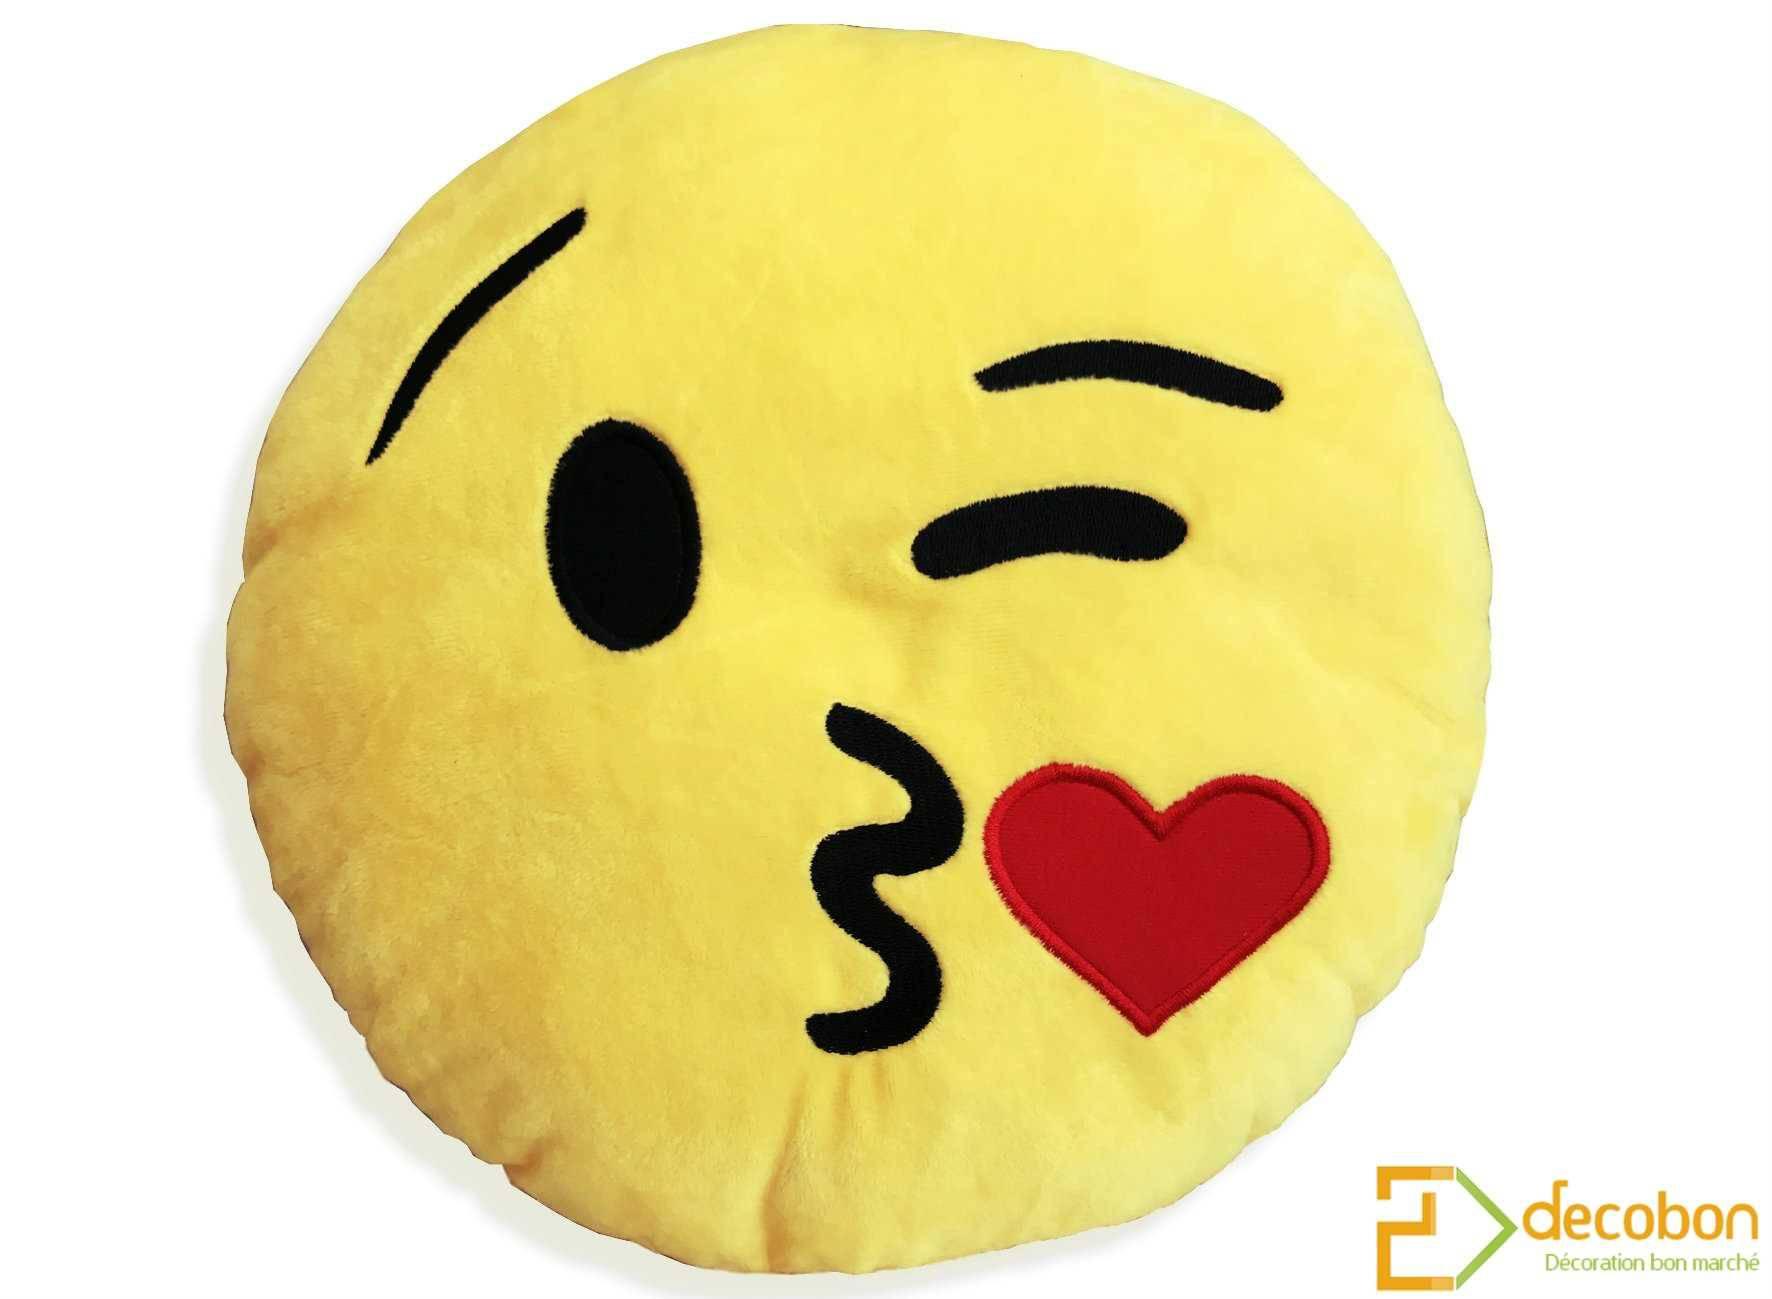 Coussin peluche smiley emoji jaune tout doux bisou coeur animaux imaginaires - Smiley bisous iphone ...